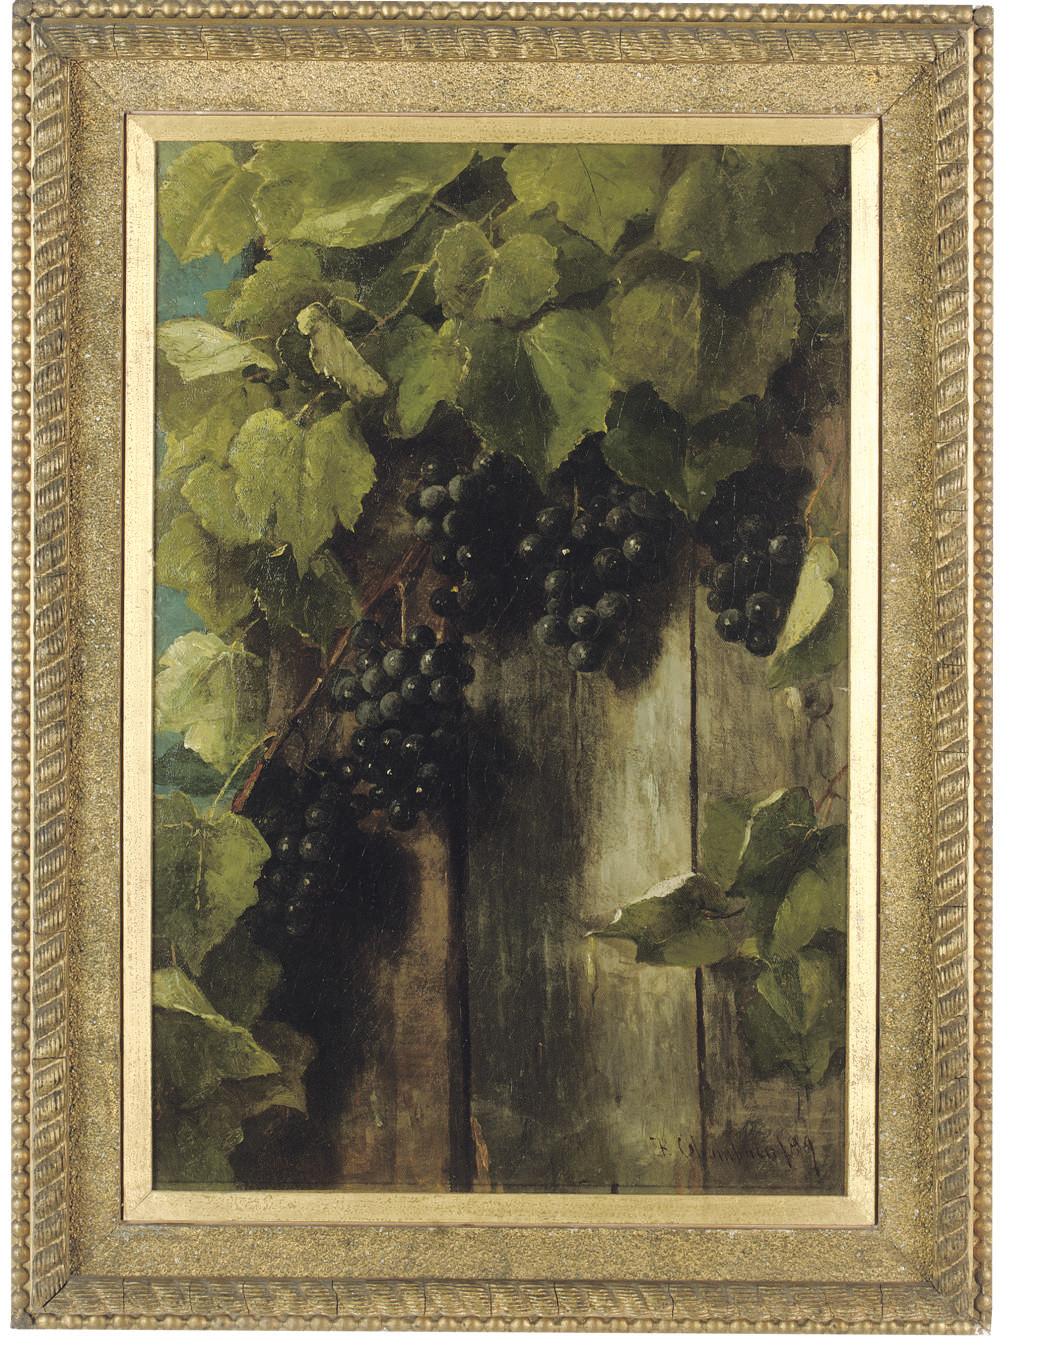 A fruiting vine